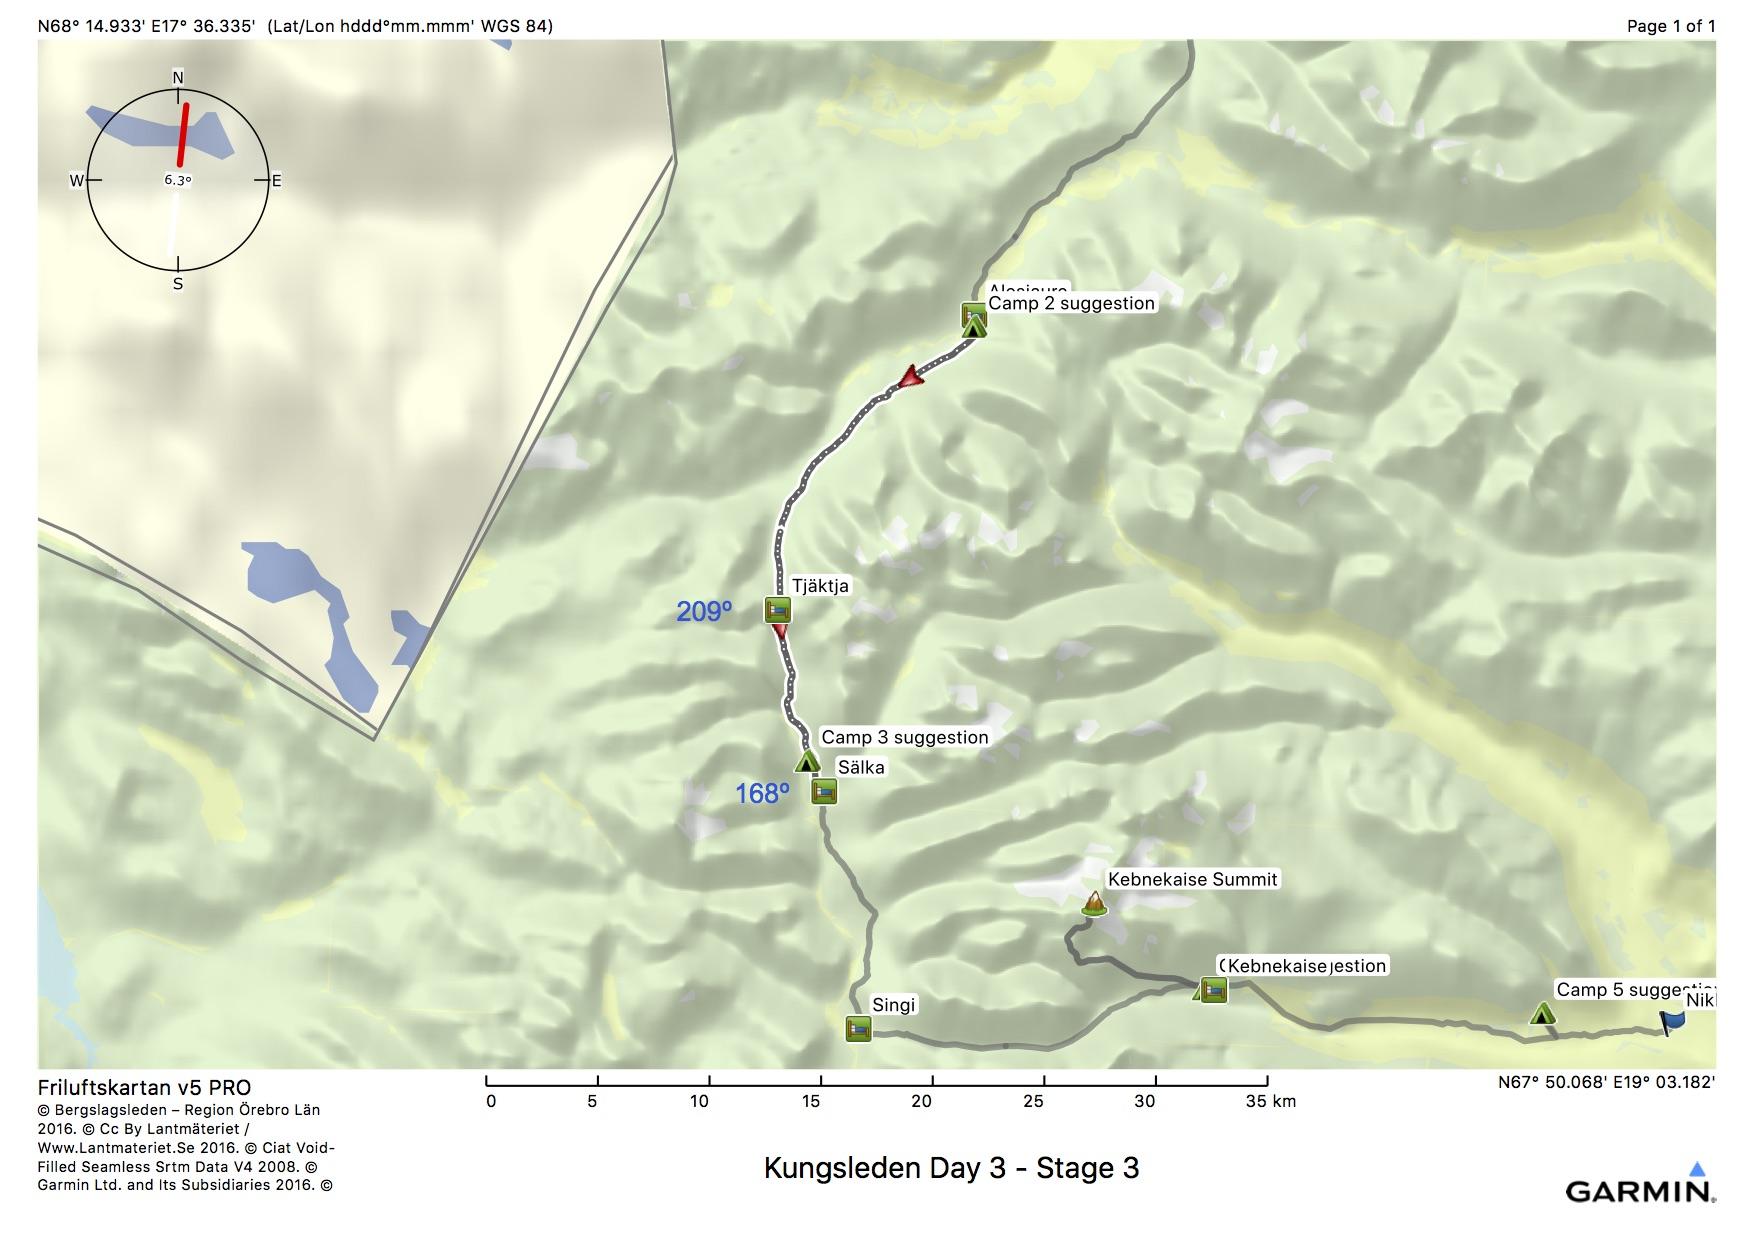 Kungsleden Day 3 - Stage 3